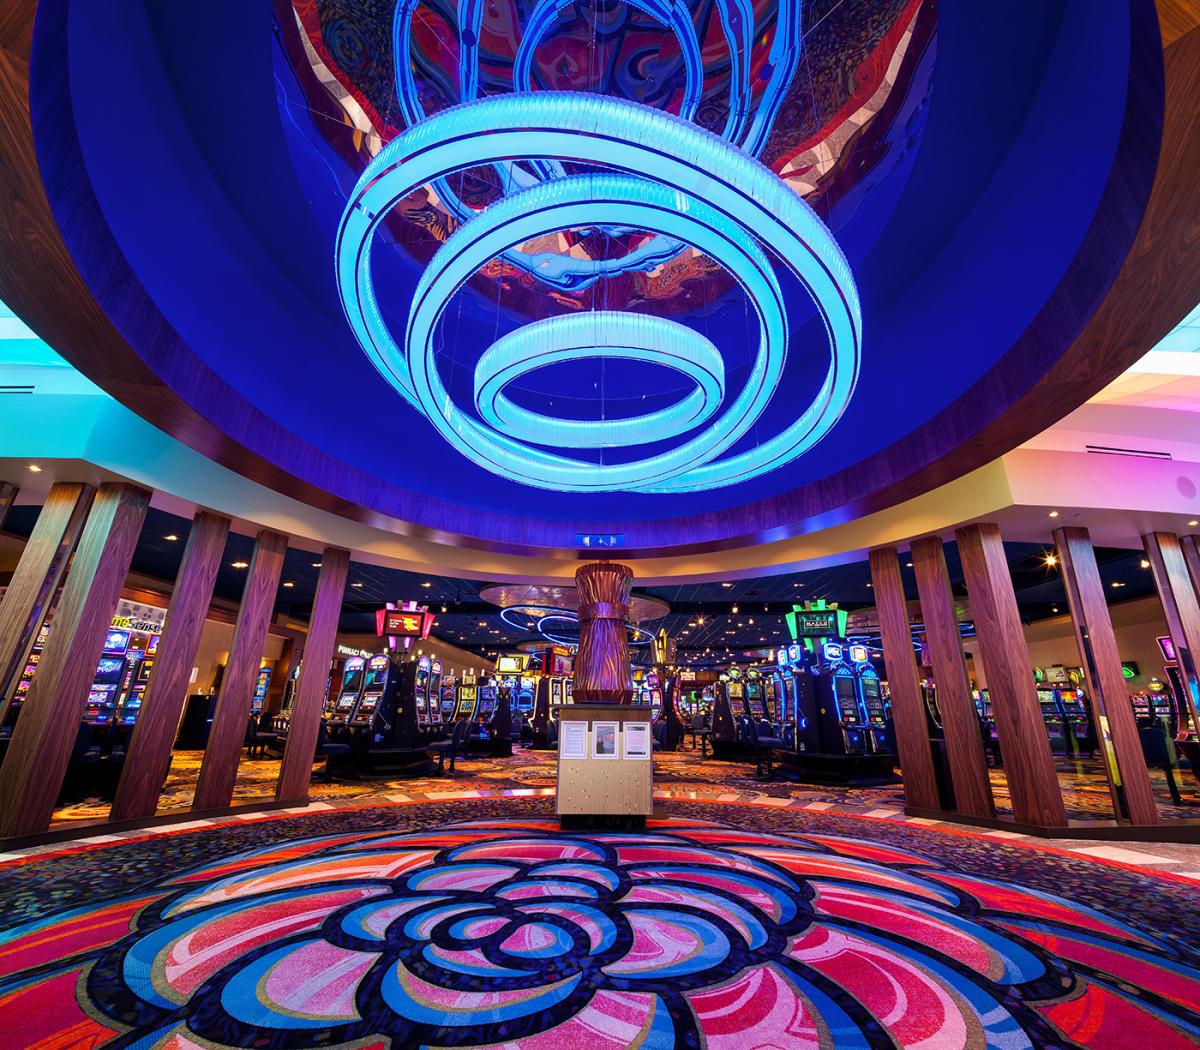 Cascades Casino